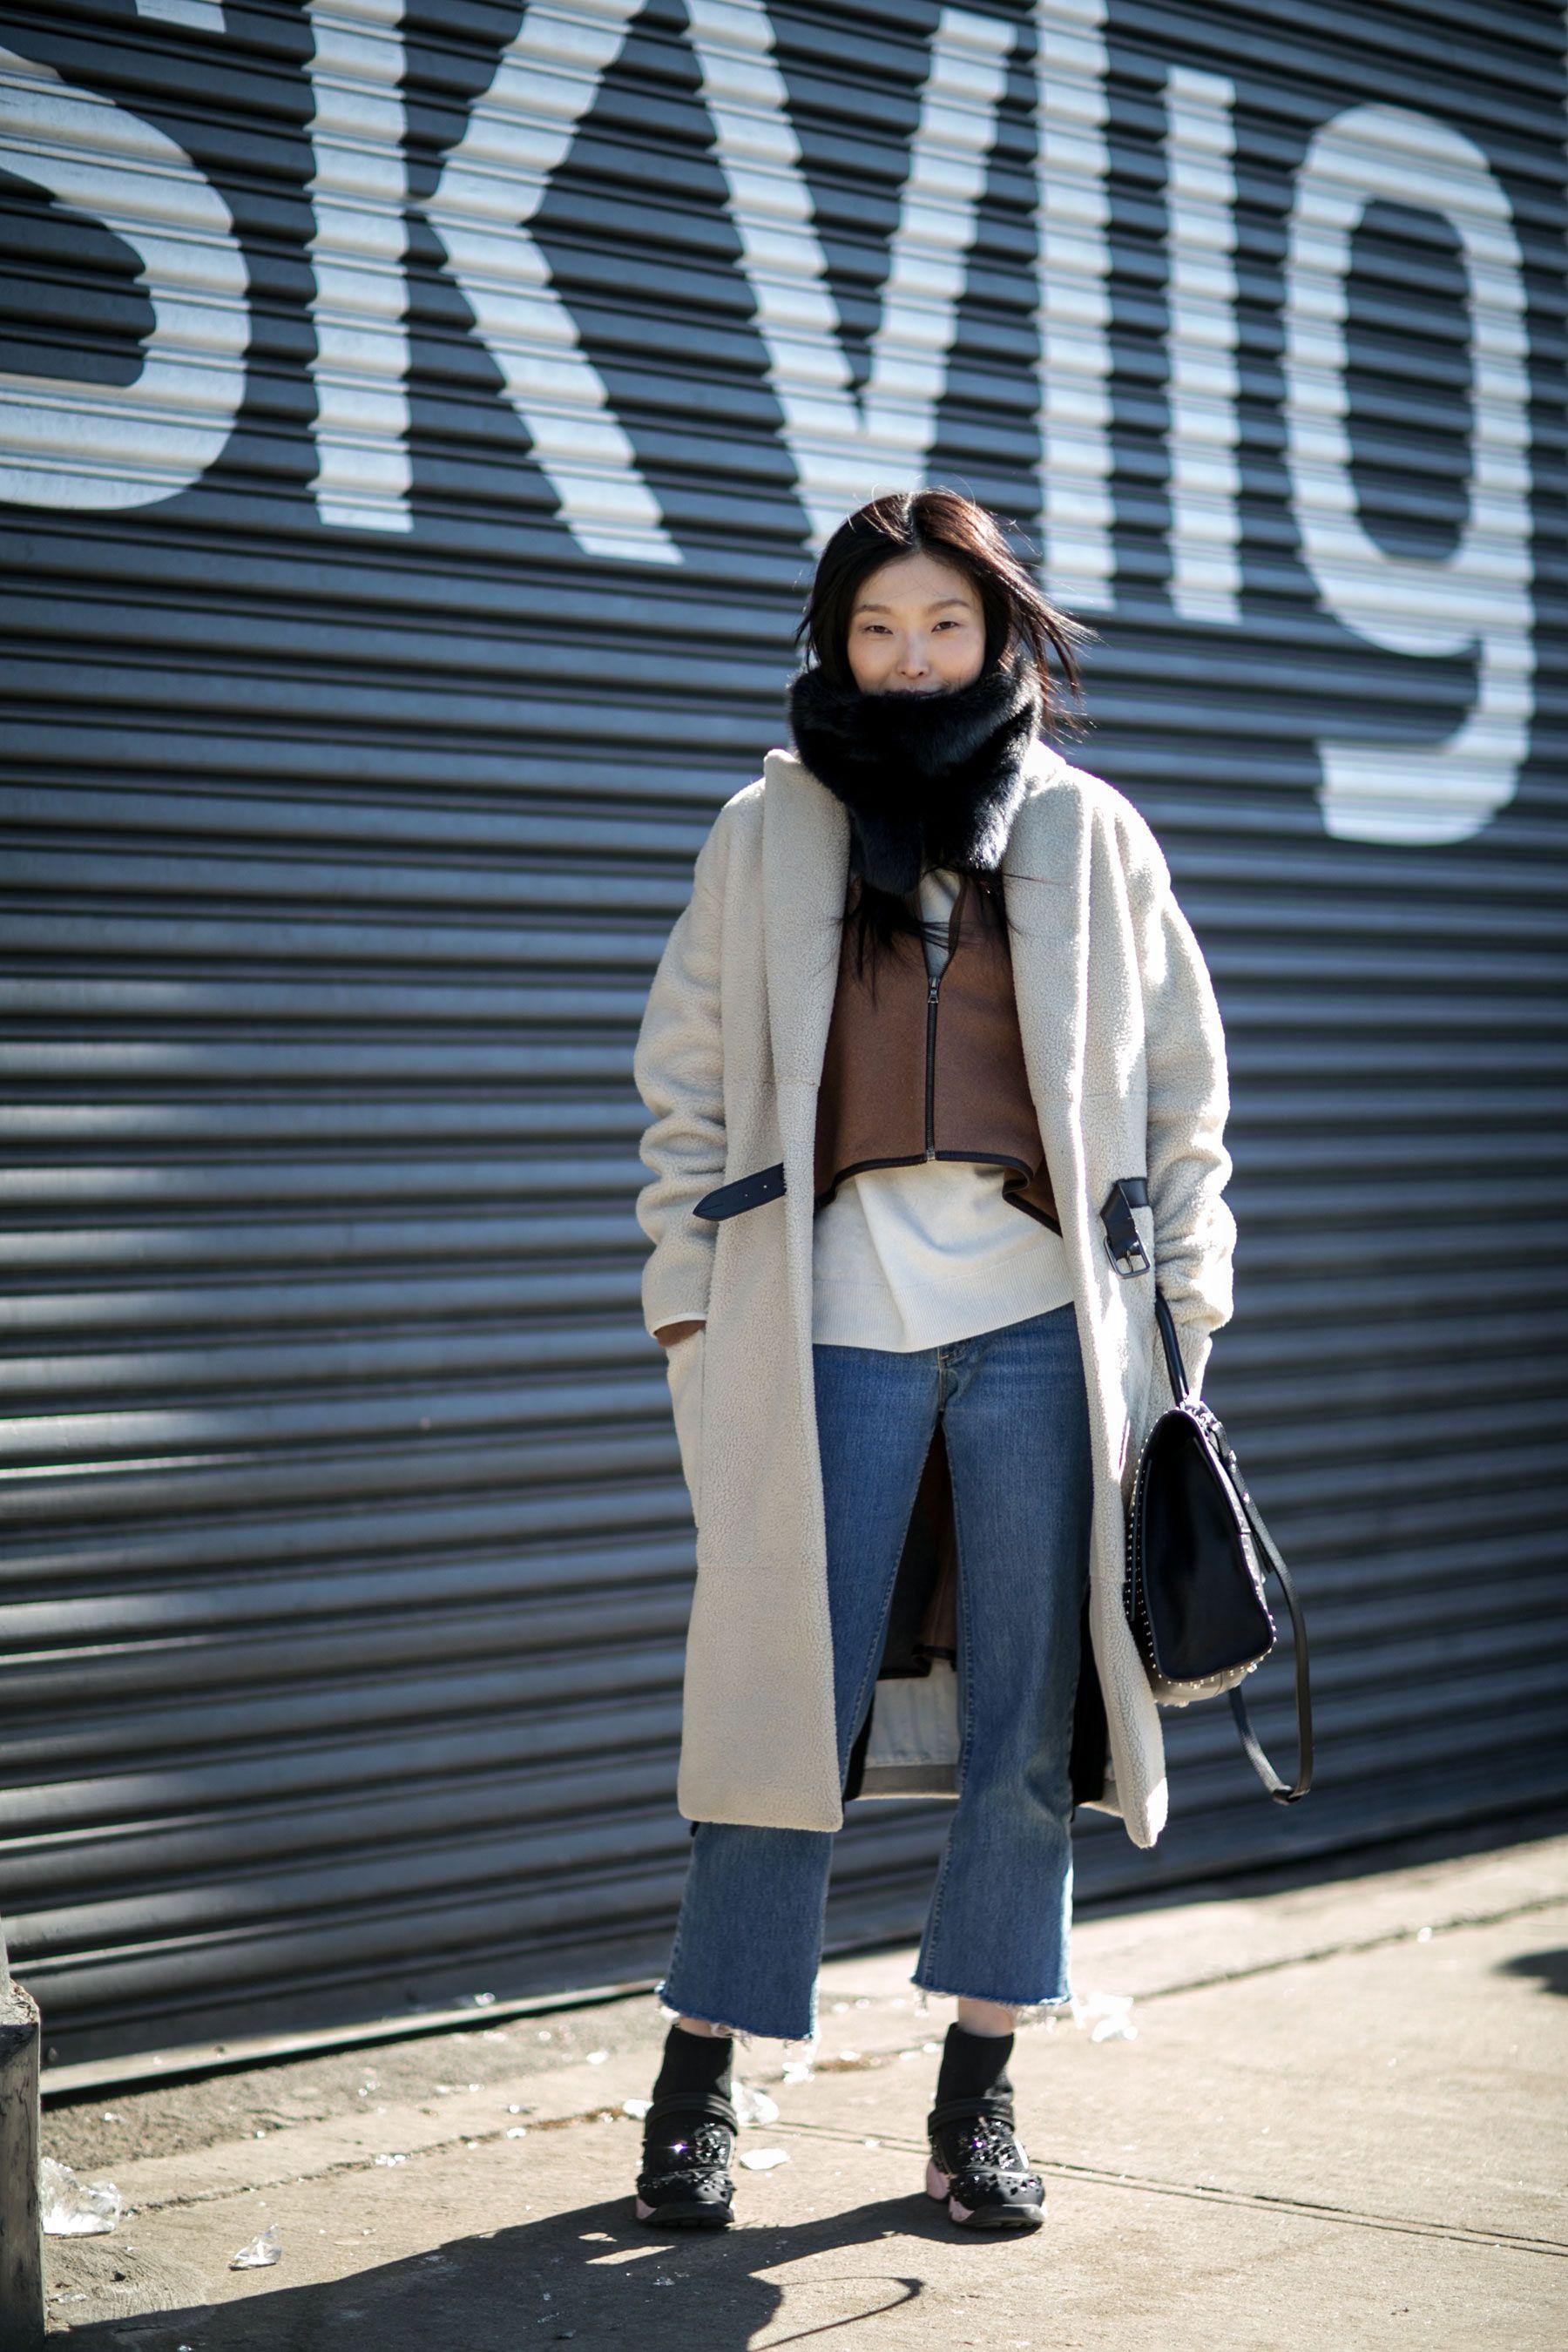 New York Fashion Week: Women's Street Style Fall 2016 Day 4 – The Impression